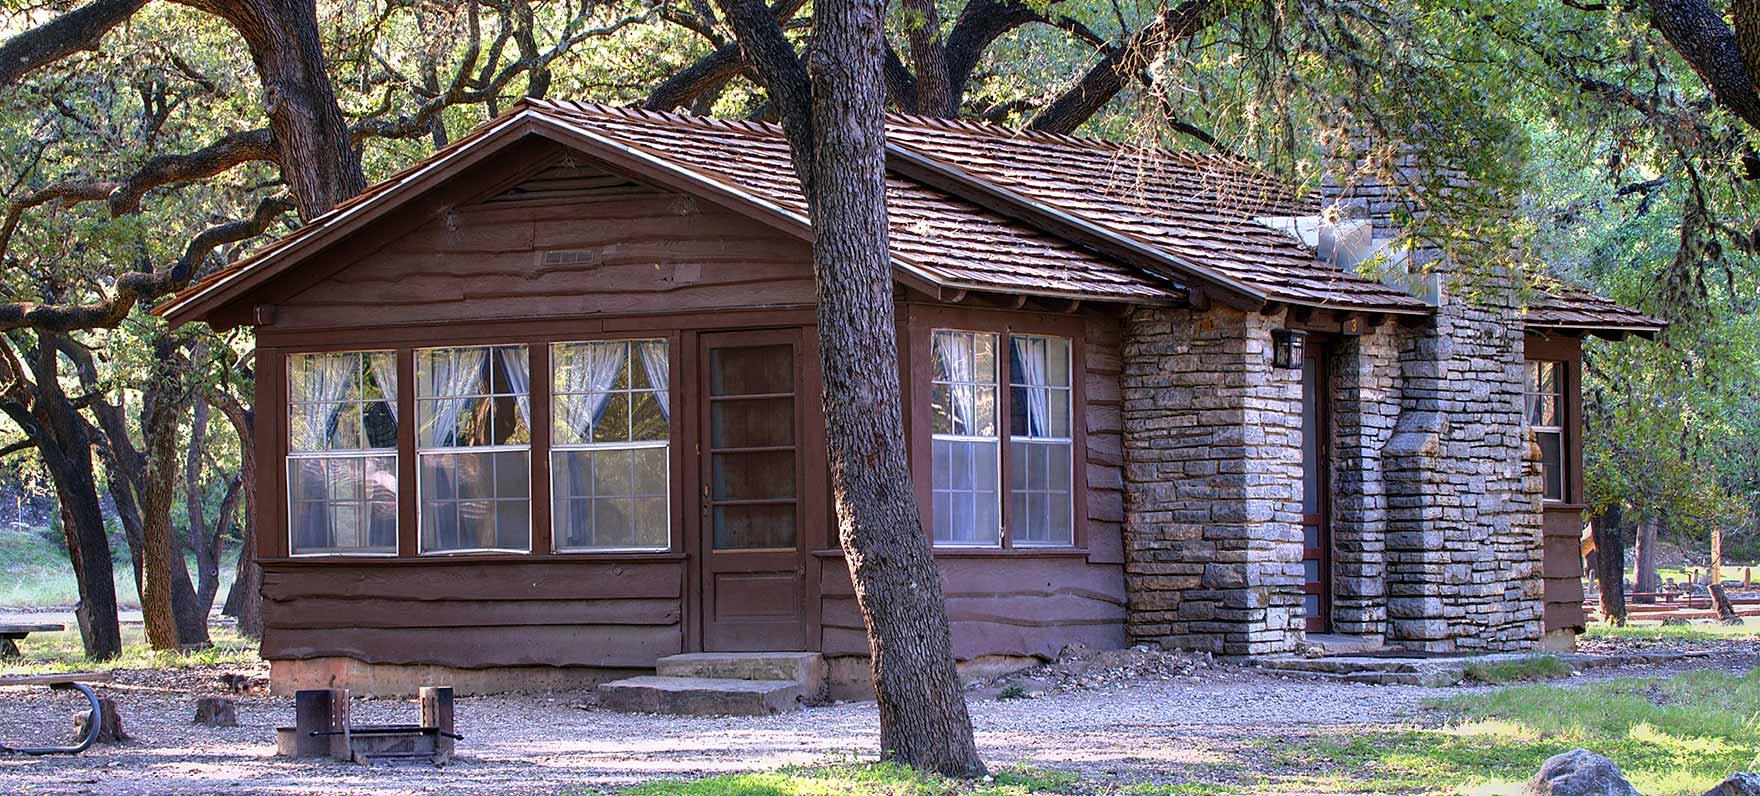 Garner State Park Texas Parks Amp Wildlife Department